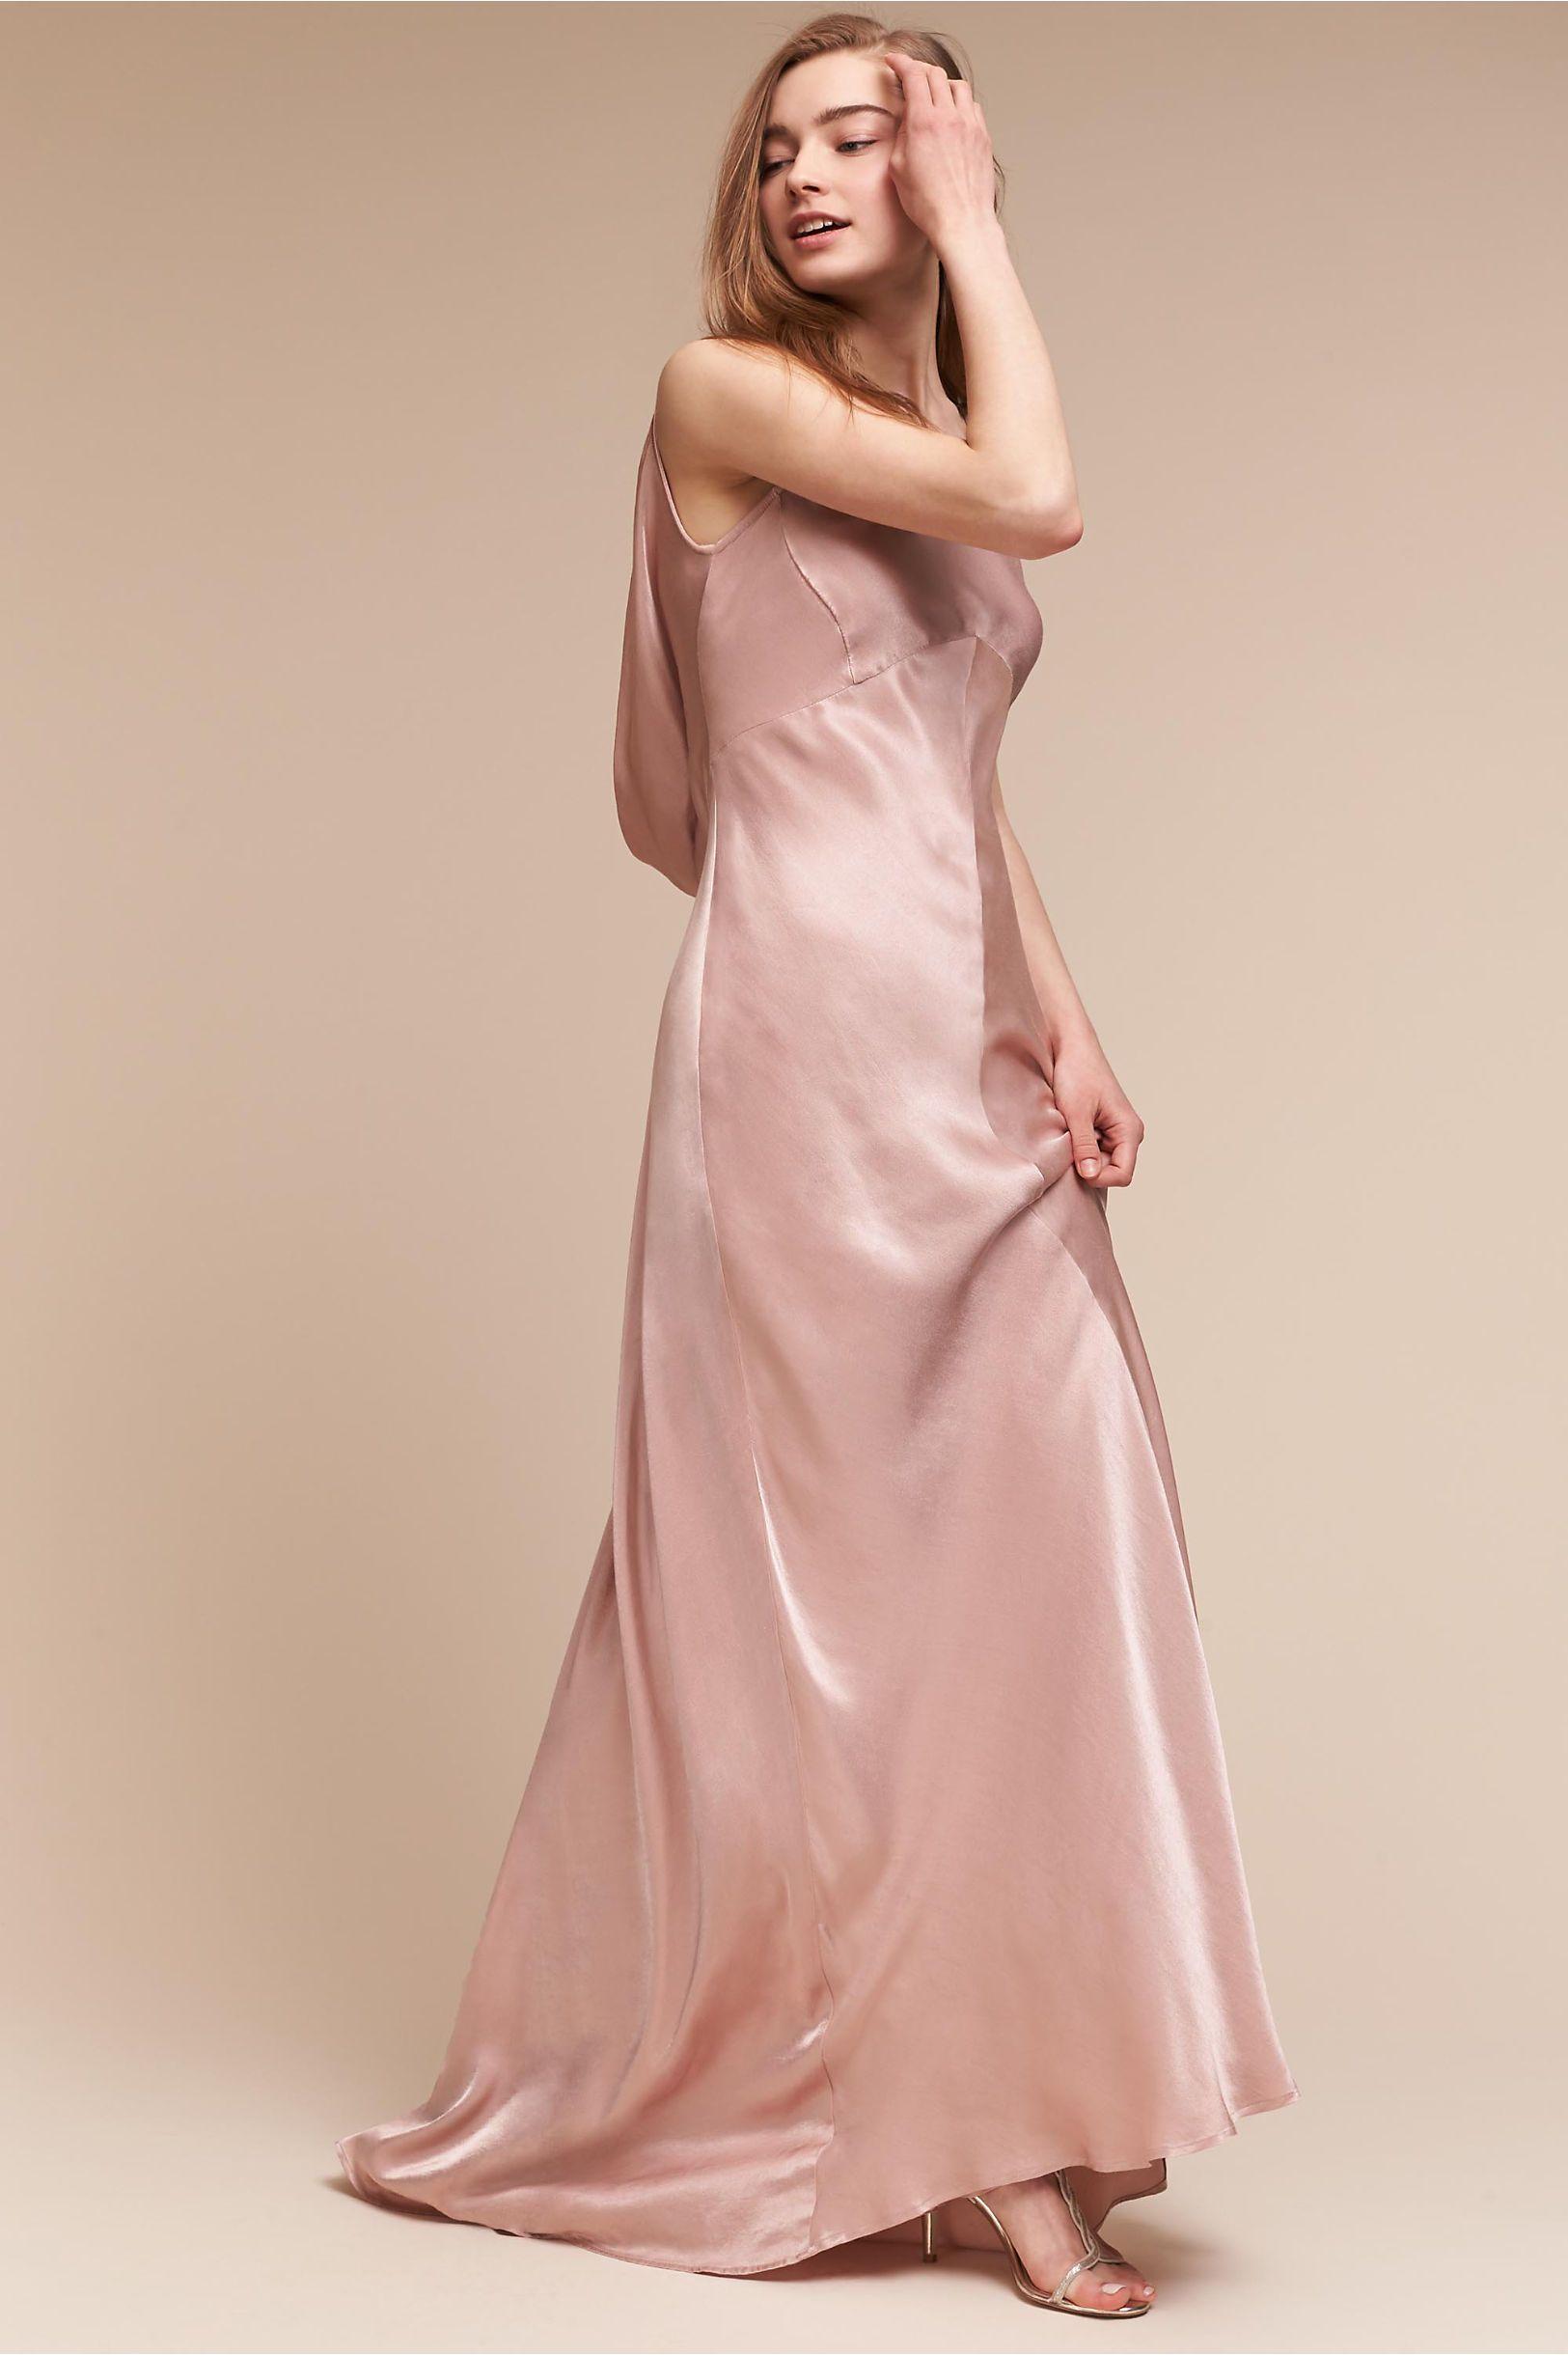 BHLDN Edie Dress in New | BHLDN | Daydream Dresses | Pinterest